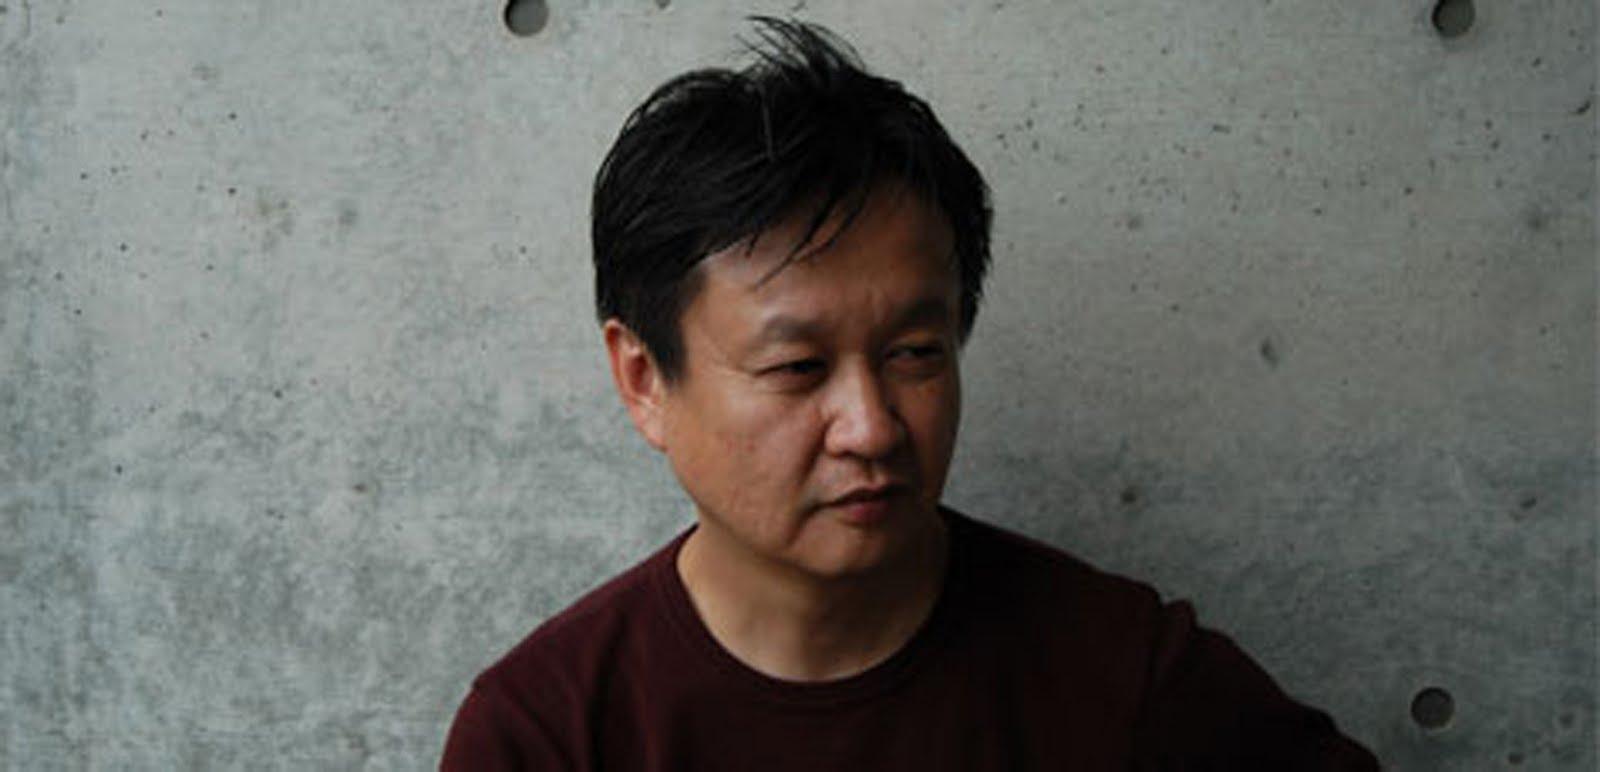 naoto fukasawa the man of clarity. Black Bedroom Furniture Sets. Home Design Ideas